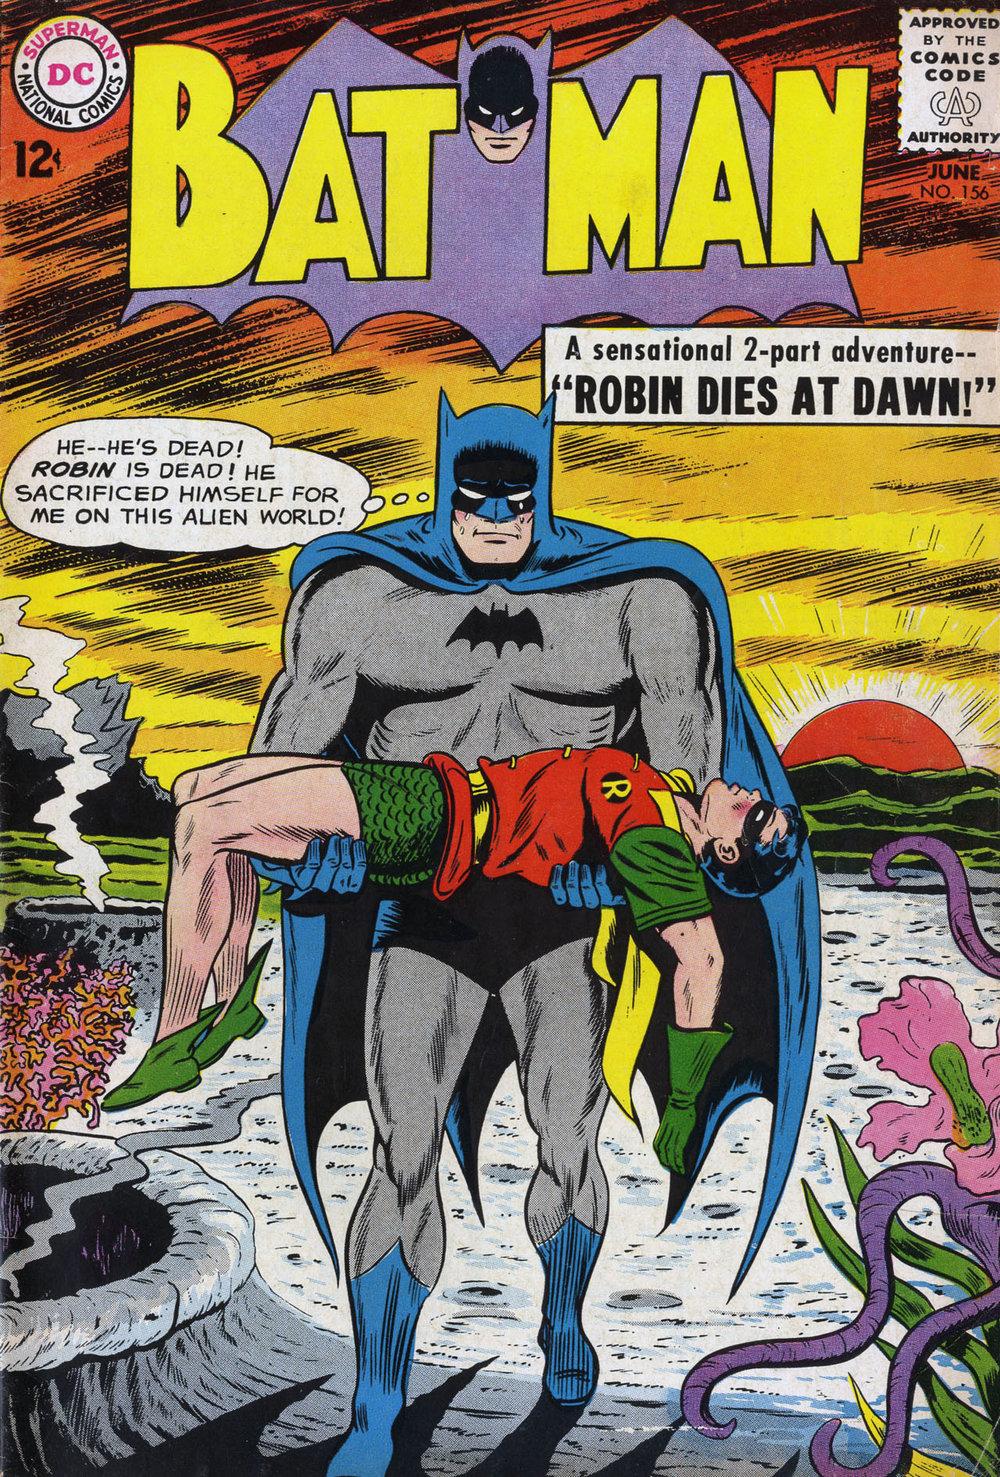 Batman #156. Cover pencils by Sheldon Moldoff.